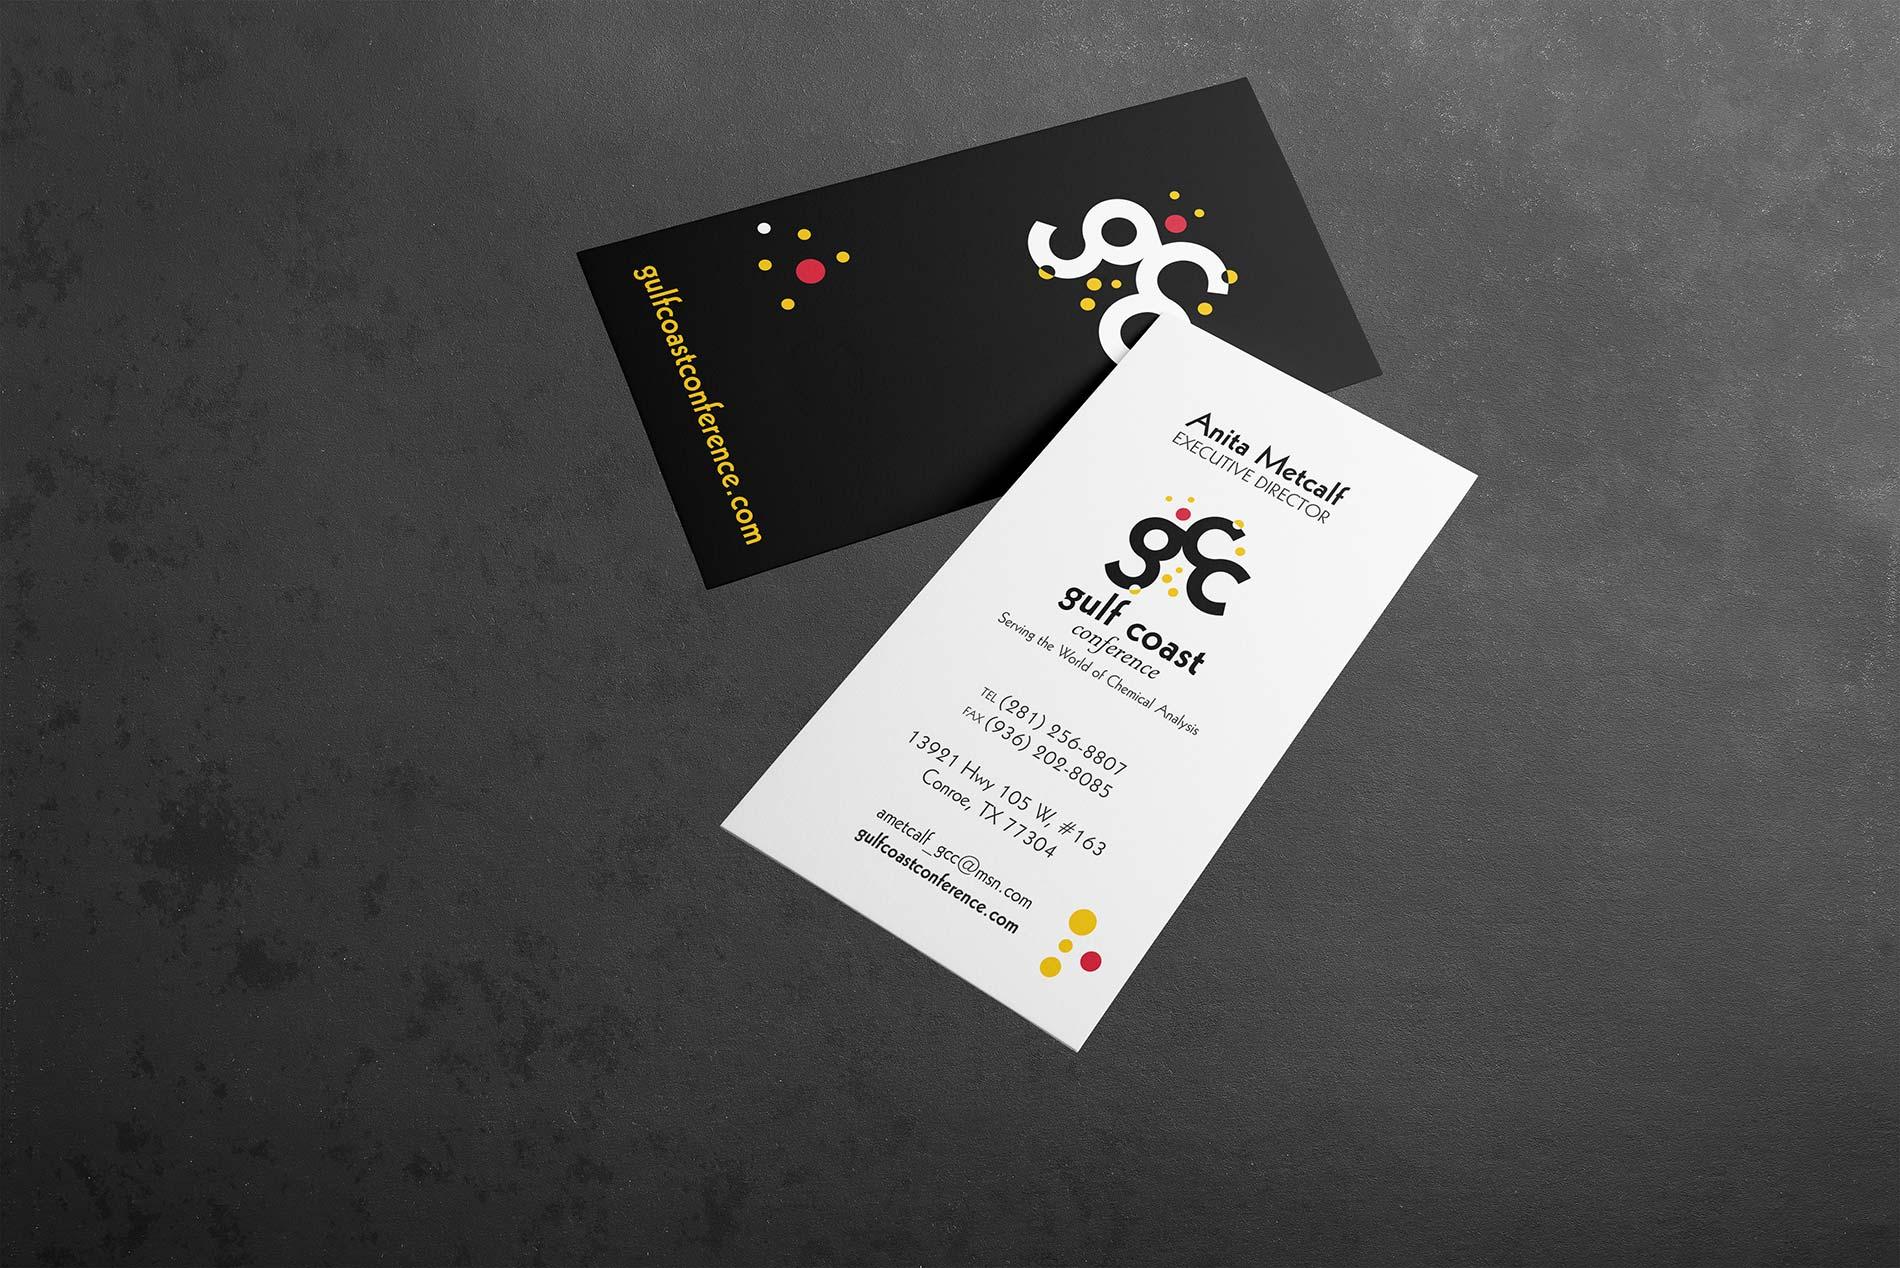 Gulf Coast Conference business card mockup